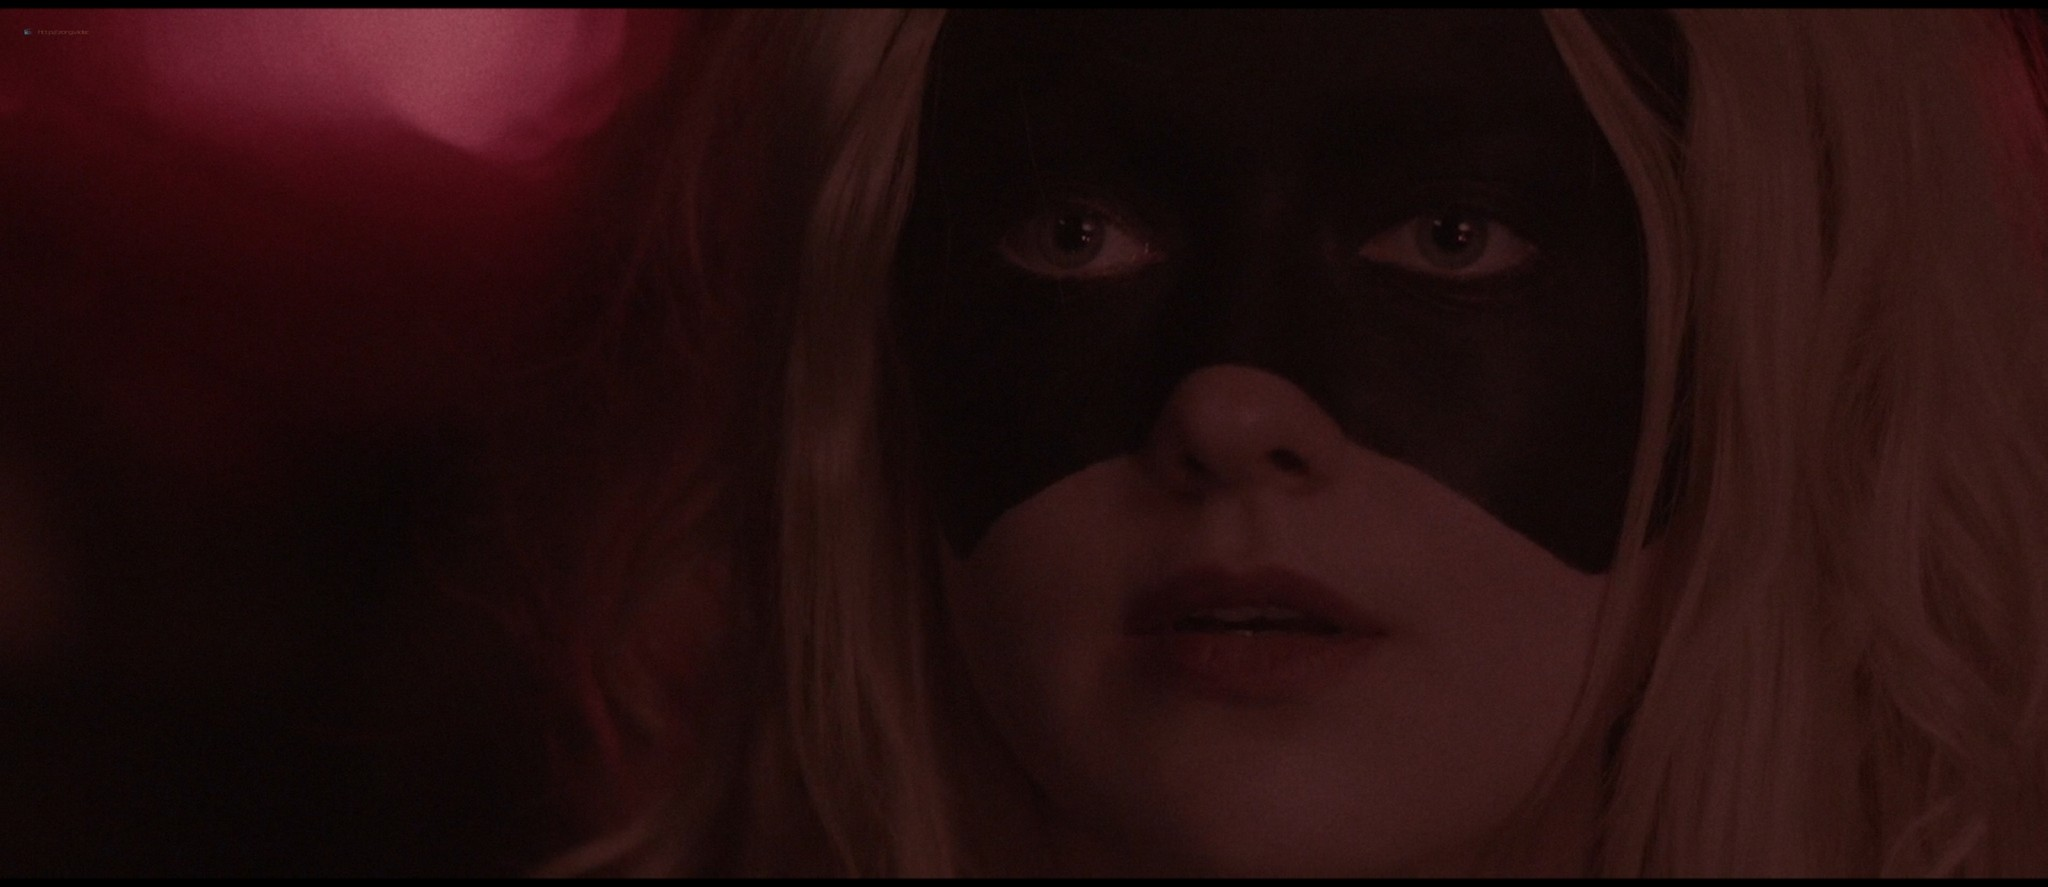 Dakota Fanning hot sex Evan Rachel Wood sexy - Viena and the Fantomes (2020) HD 1080p Web (2)